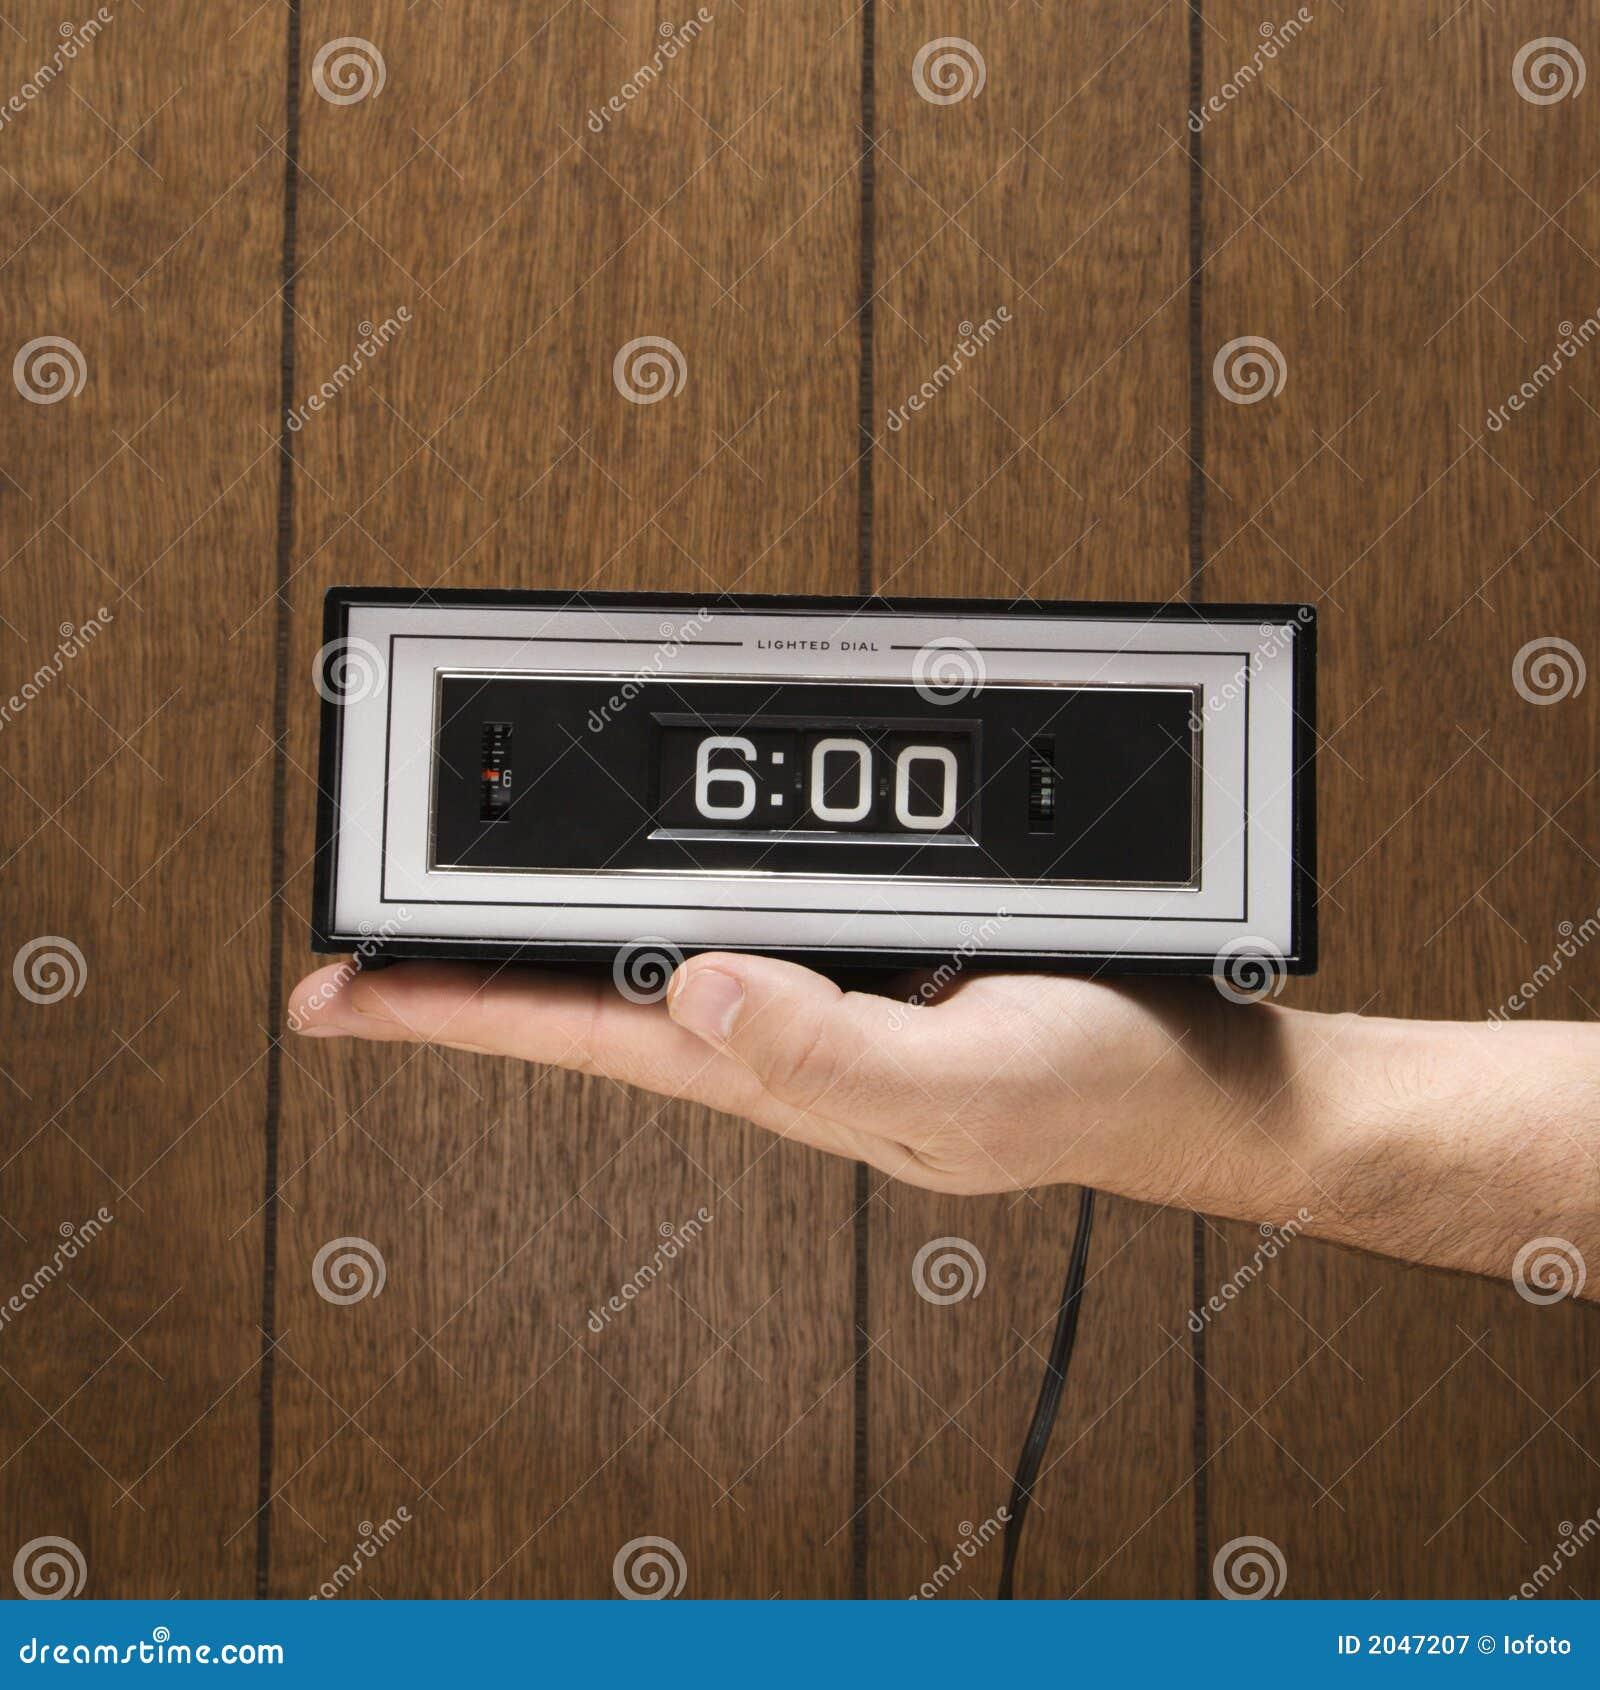 Hand holding retro clock set